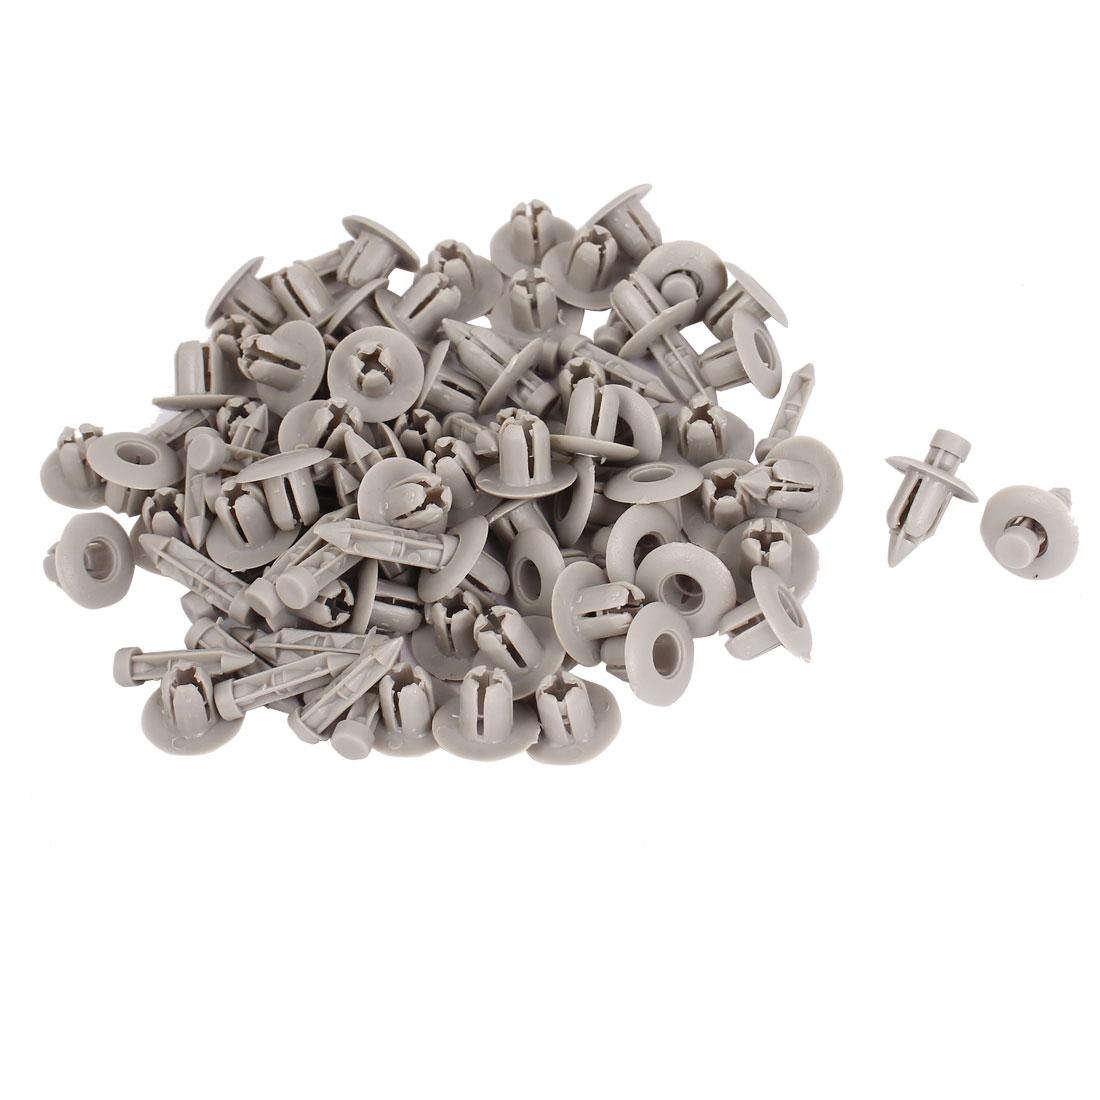 100 Pcs Gray Plastic Rivet Trim Fastener Moulding Clips 7mm x 14mm x 14mm